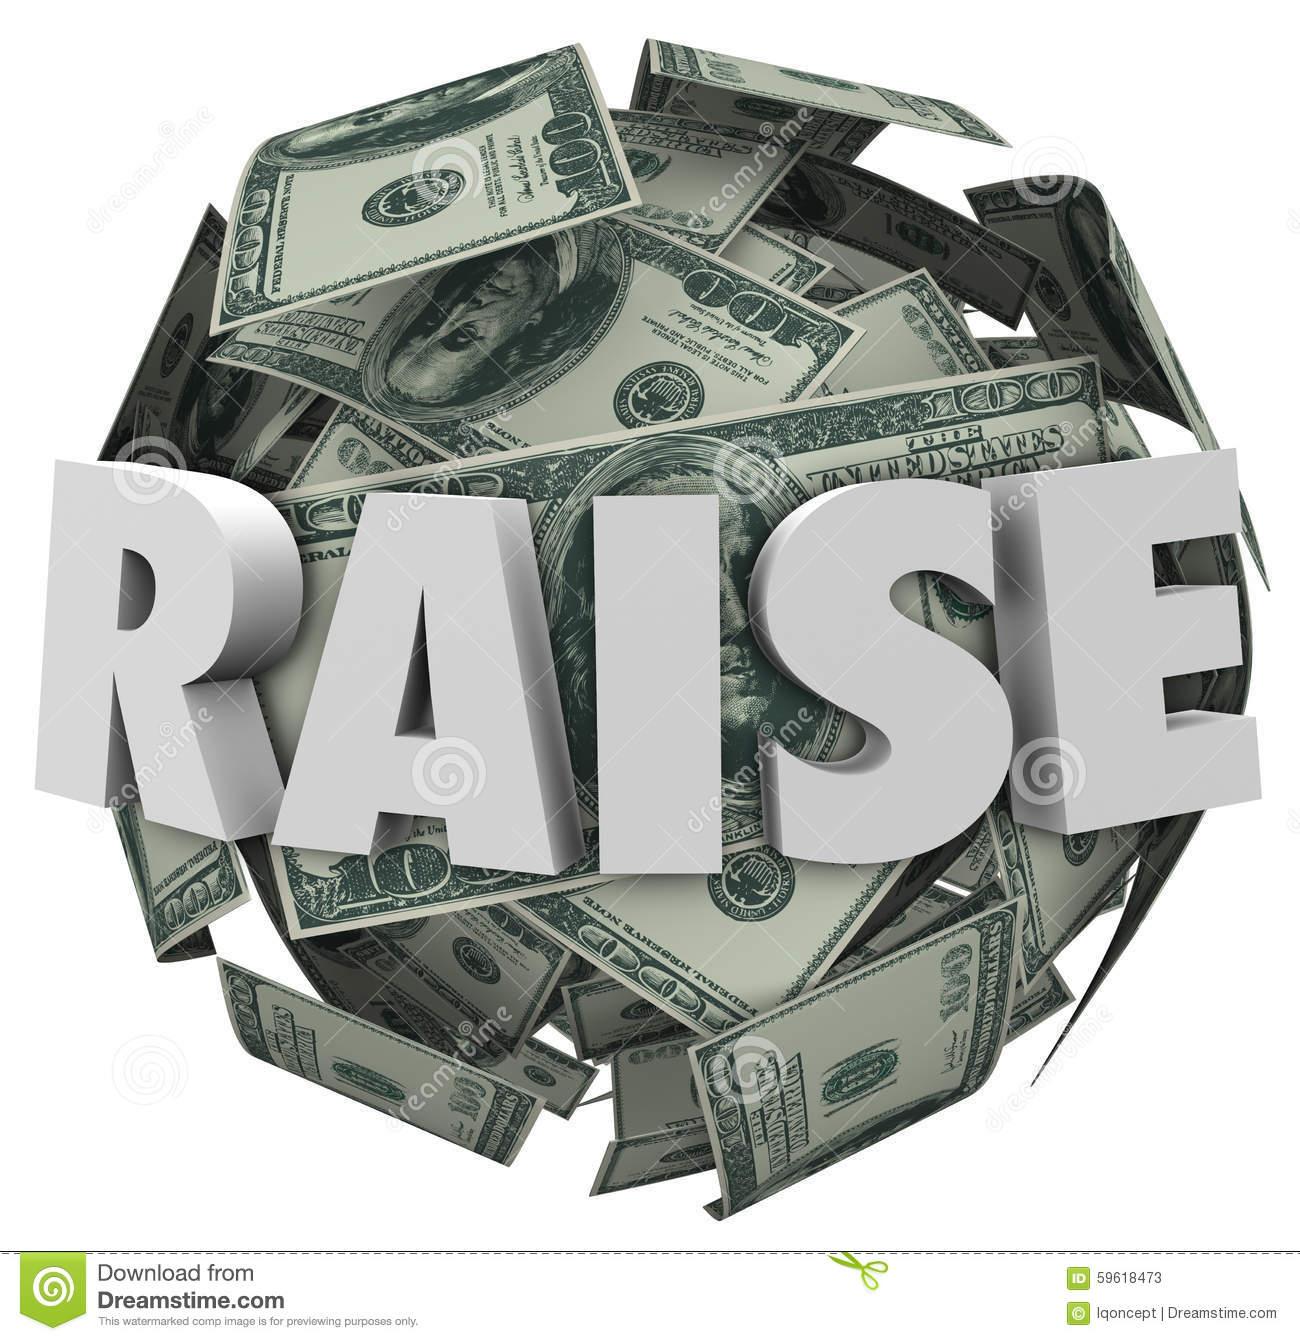 How To Raise Money Clipboard Checklist Venture Capital New Busin.